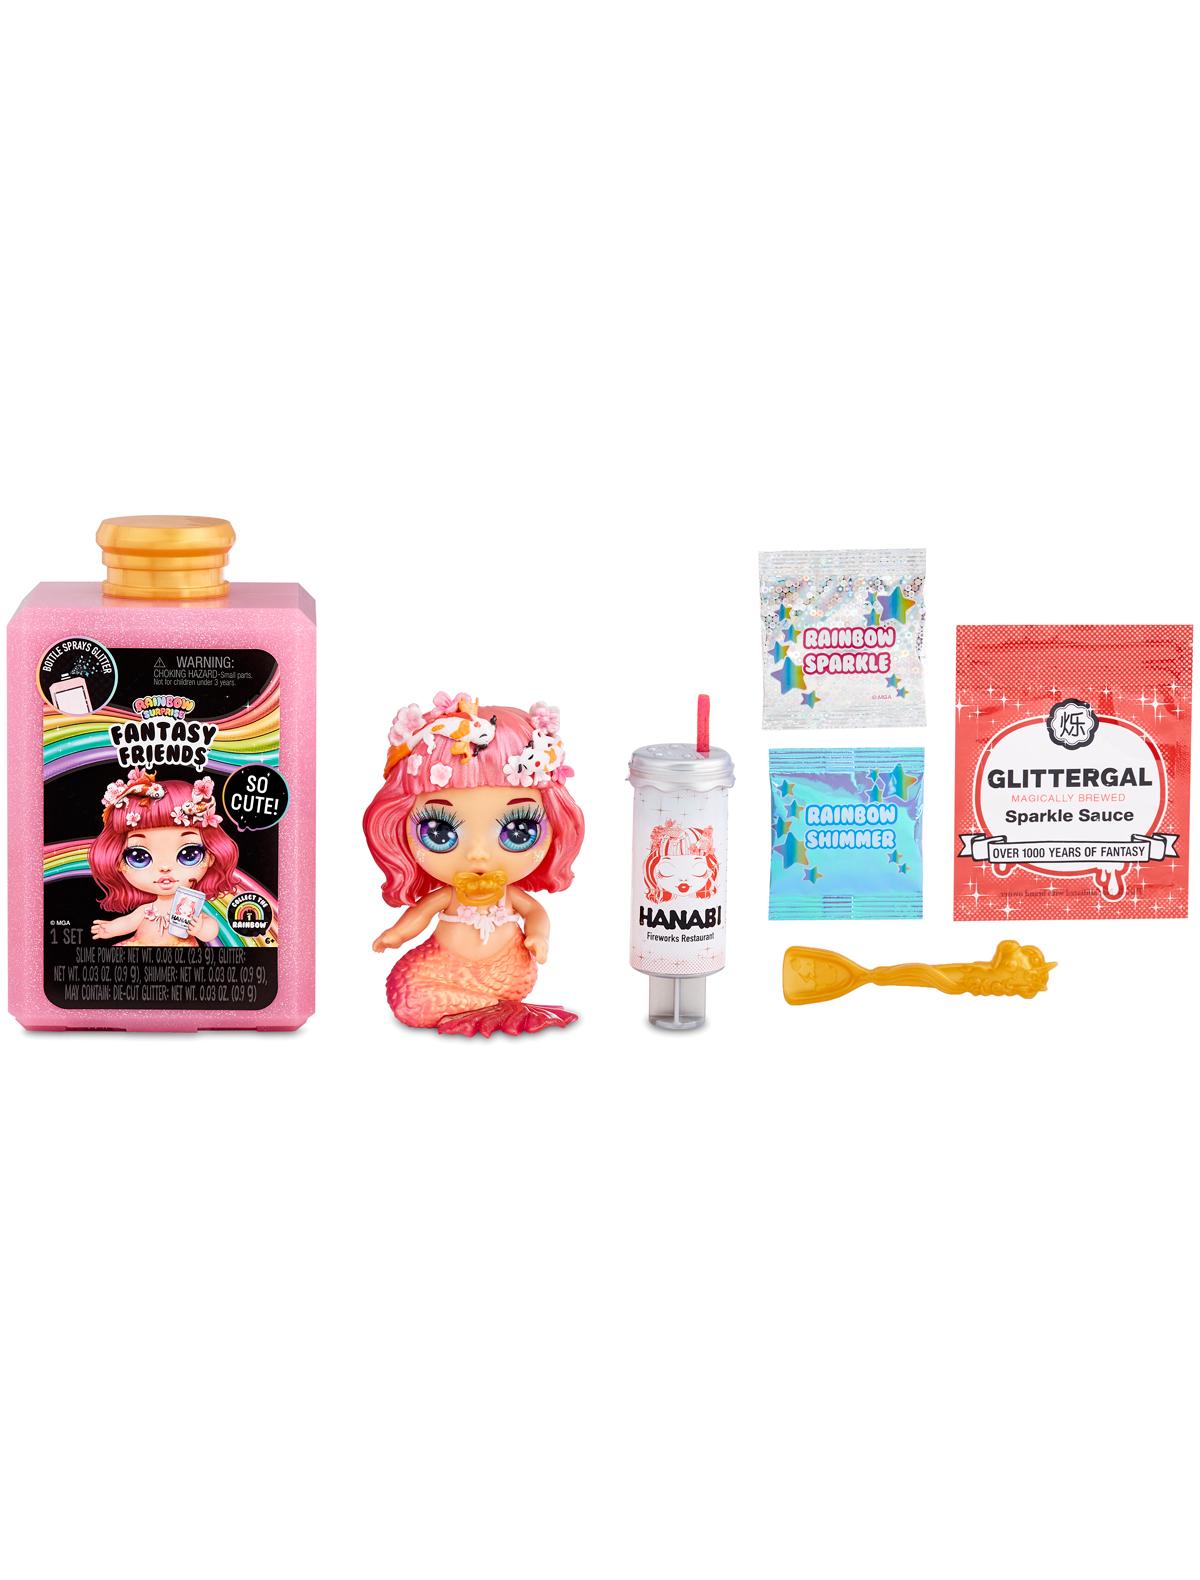 Купить 2258376, Игрушка Poopsie, розовый, 7134529081530